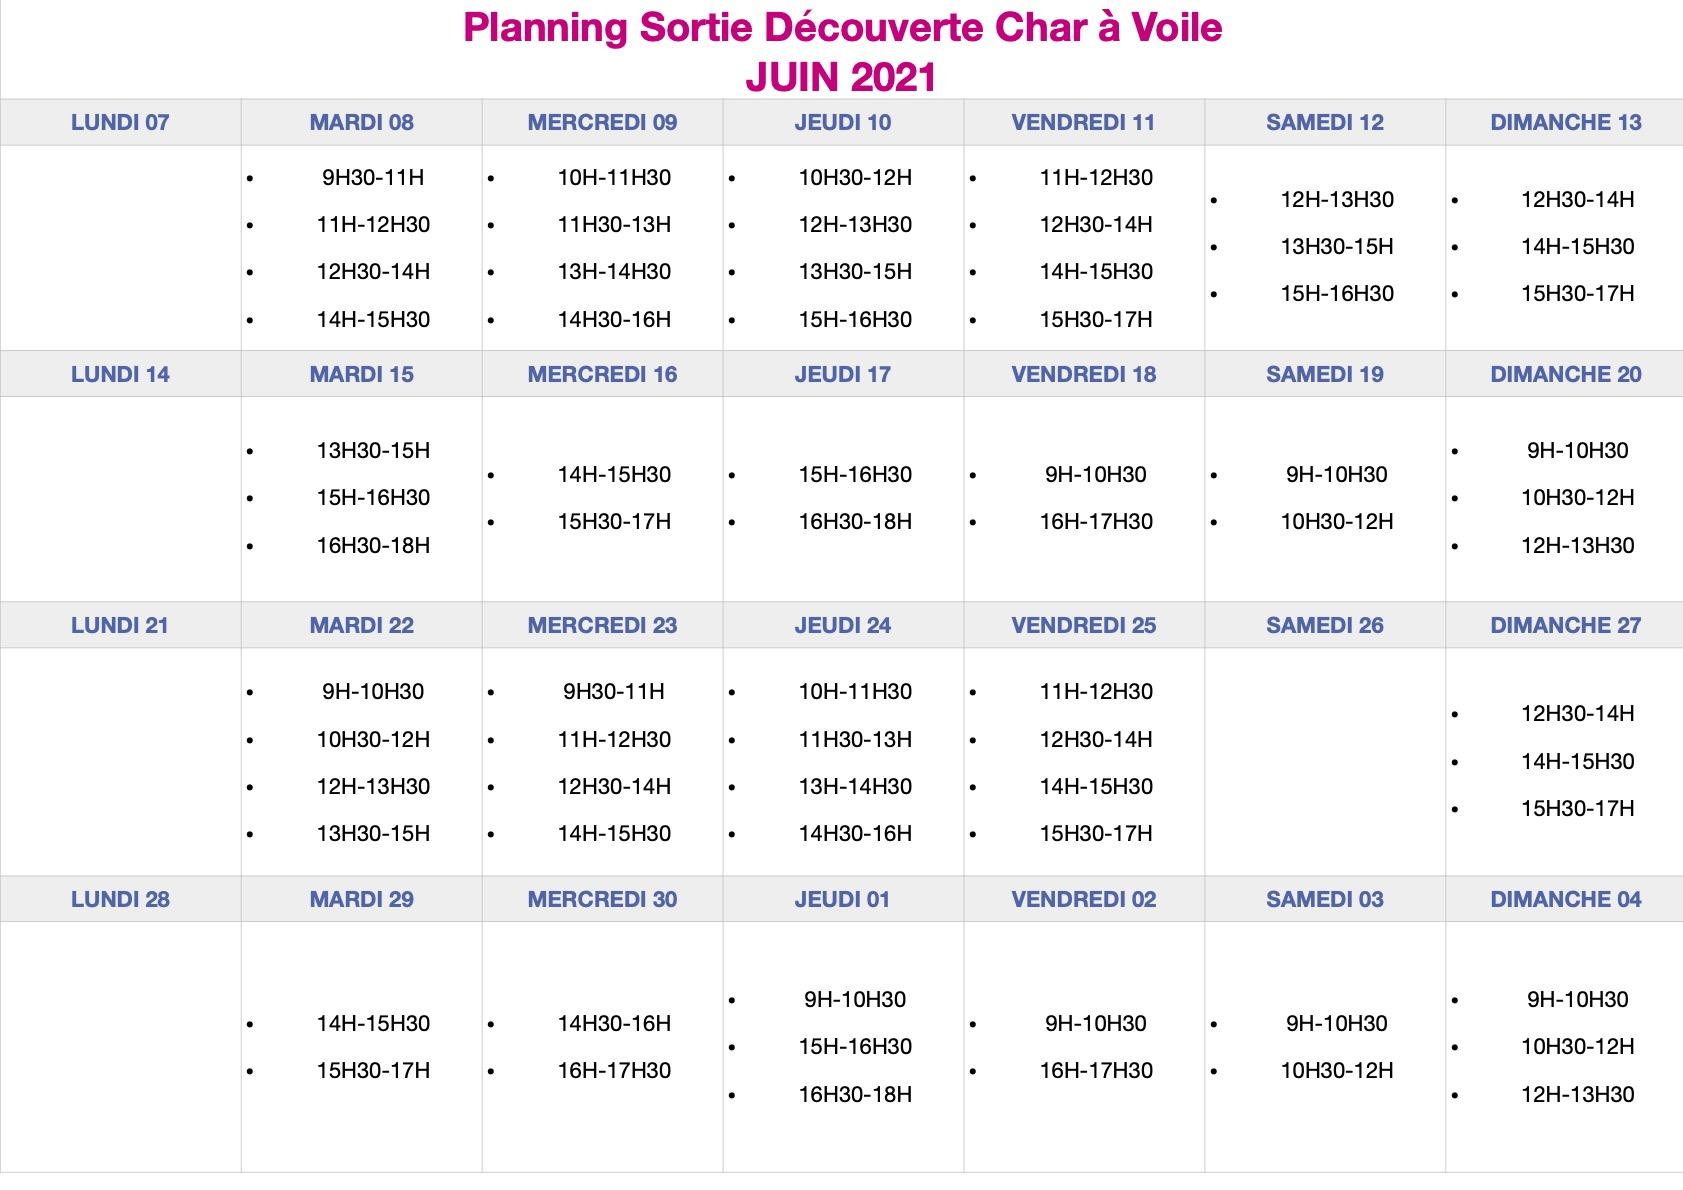 Planning CÀV 06_21 JPEG.jpg